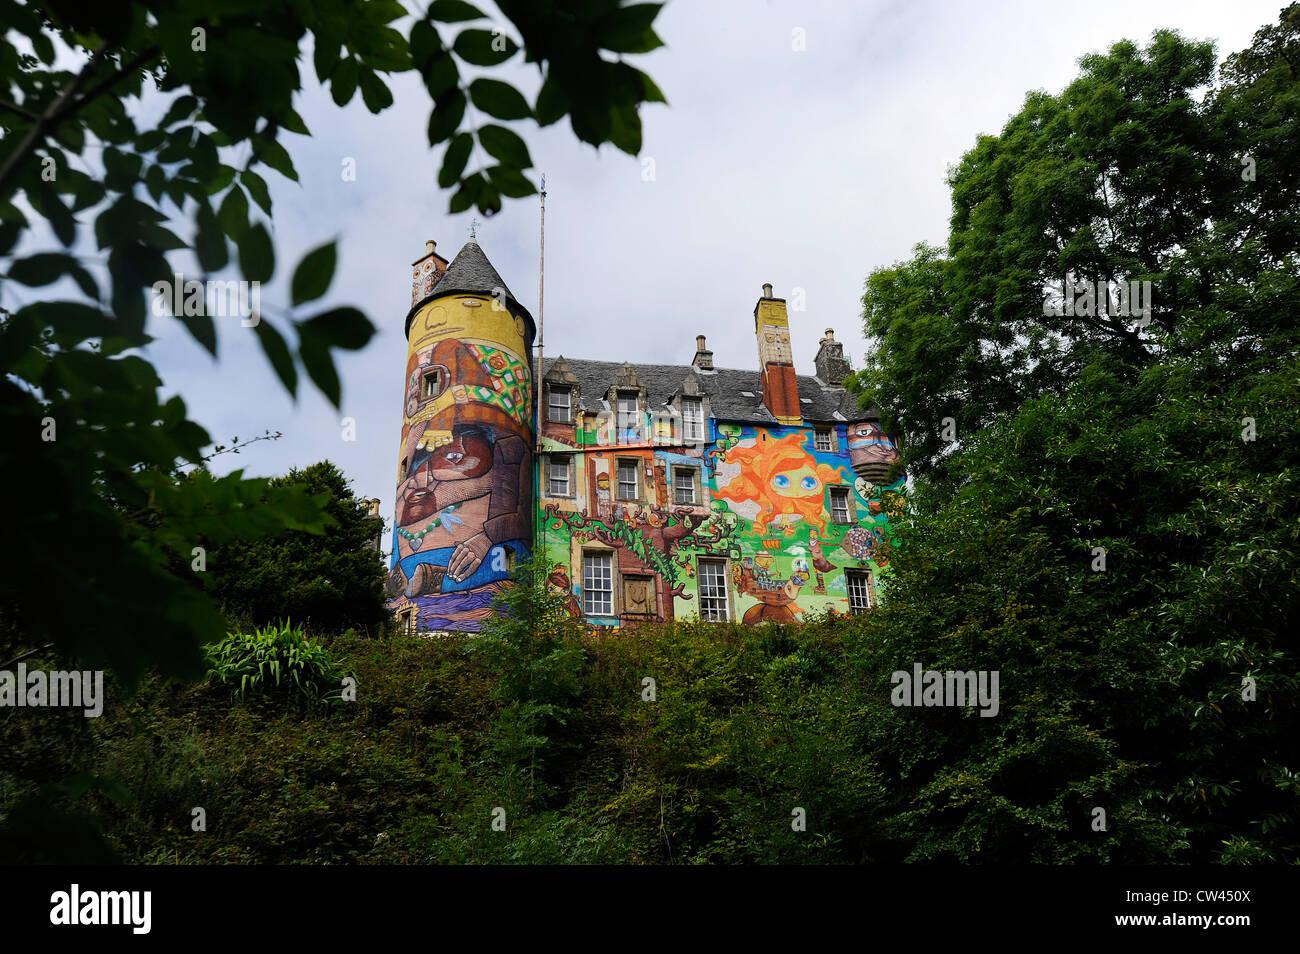 kelburn castle ayrshire schottland haus graffiti kunst. Black Bedroom Furniture Sets. Home Design Ideas